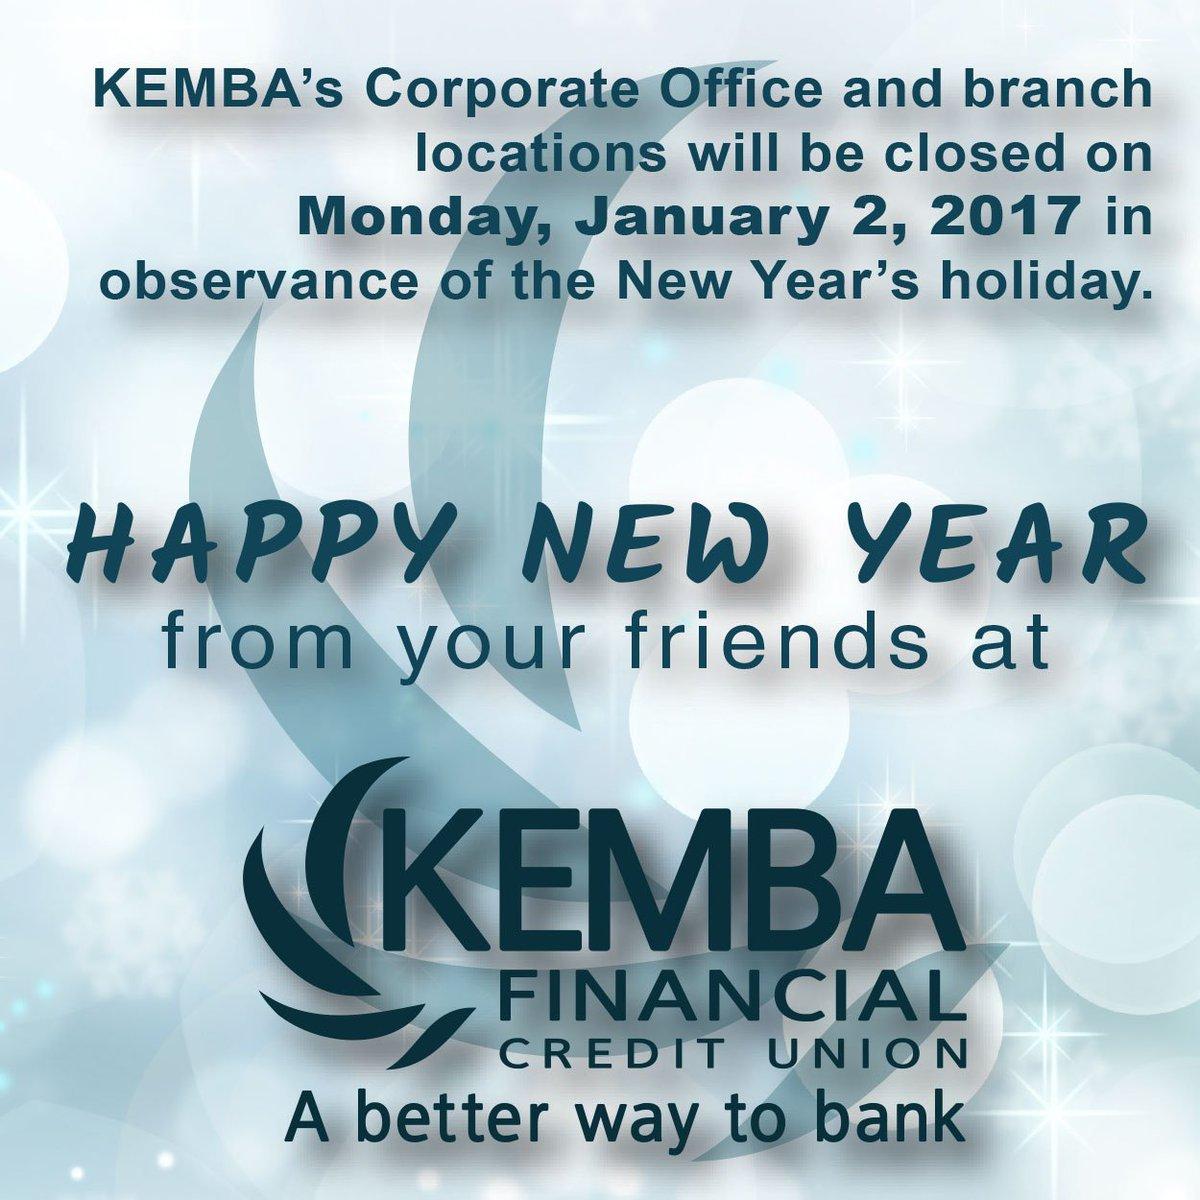 Kemba Financial Cu On Twitter Happy New Year